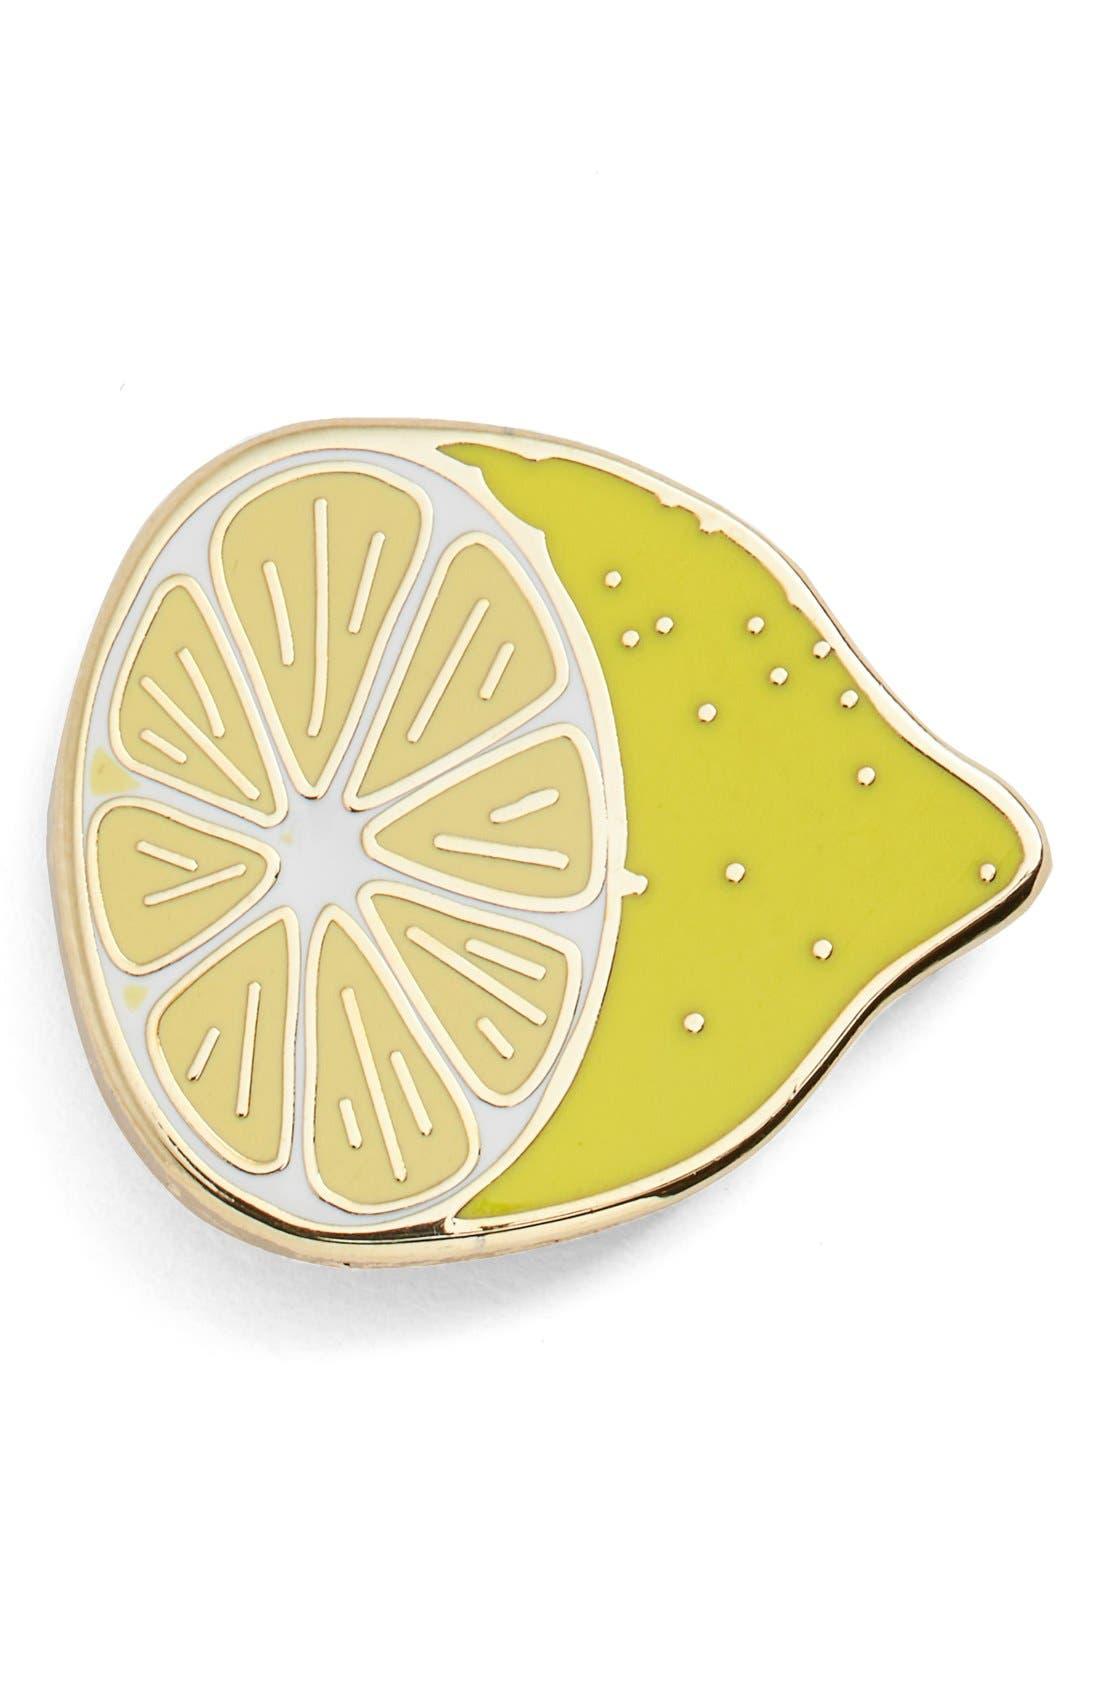 Alternate Image 1 Selected - Big Bud Press 'Small Lemon' Pin